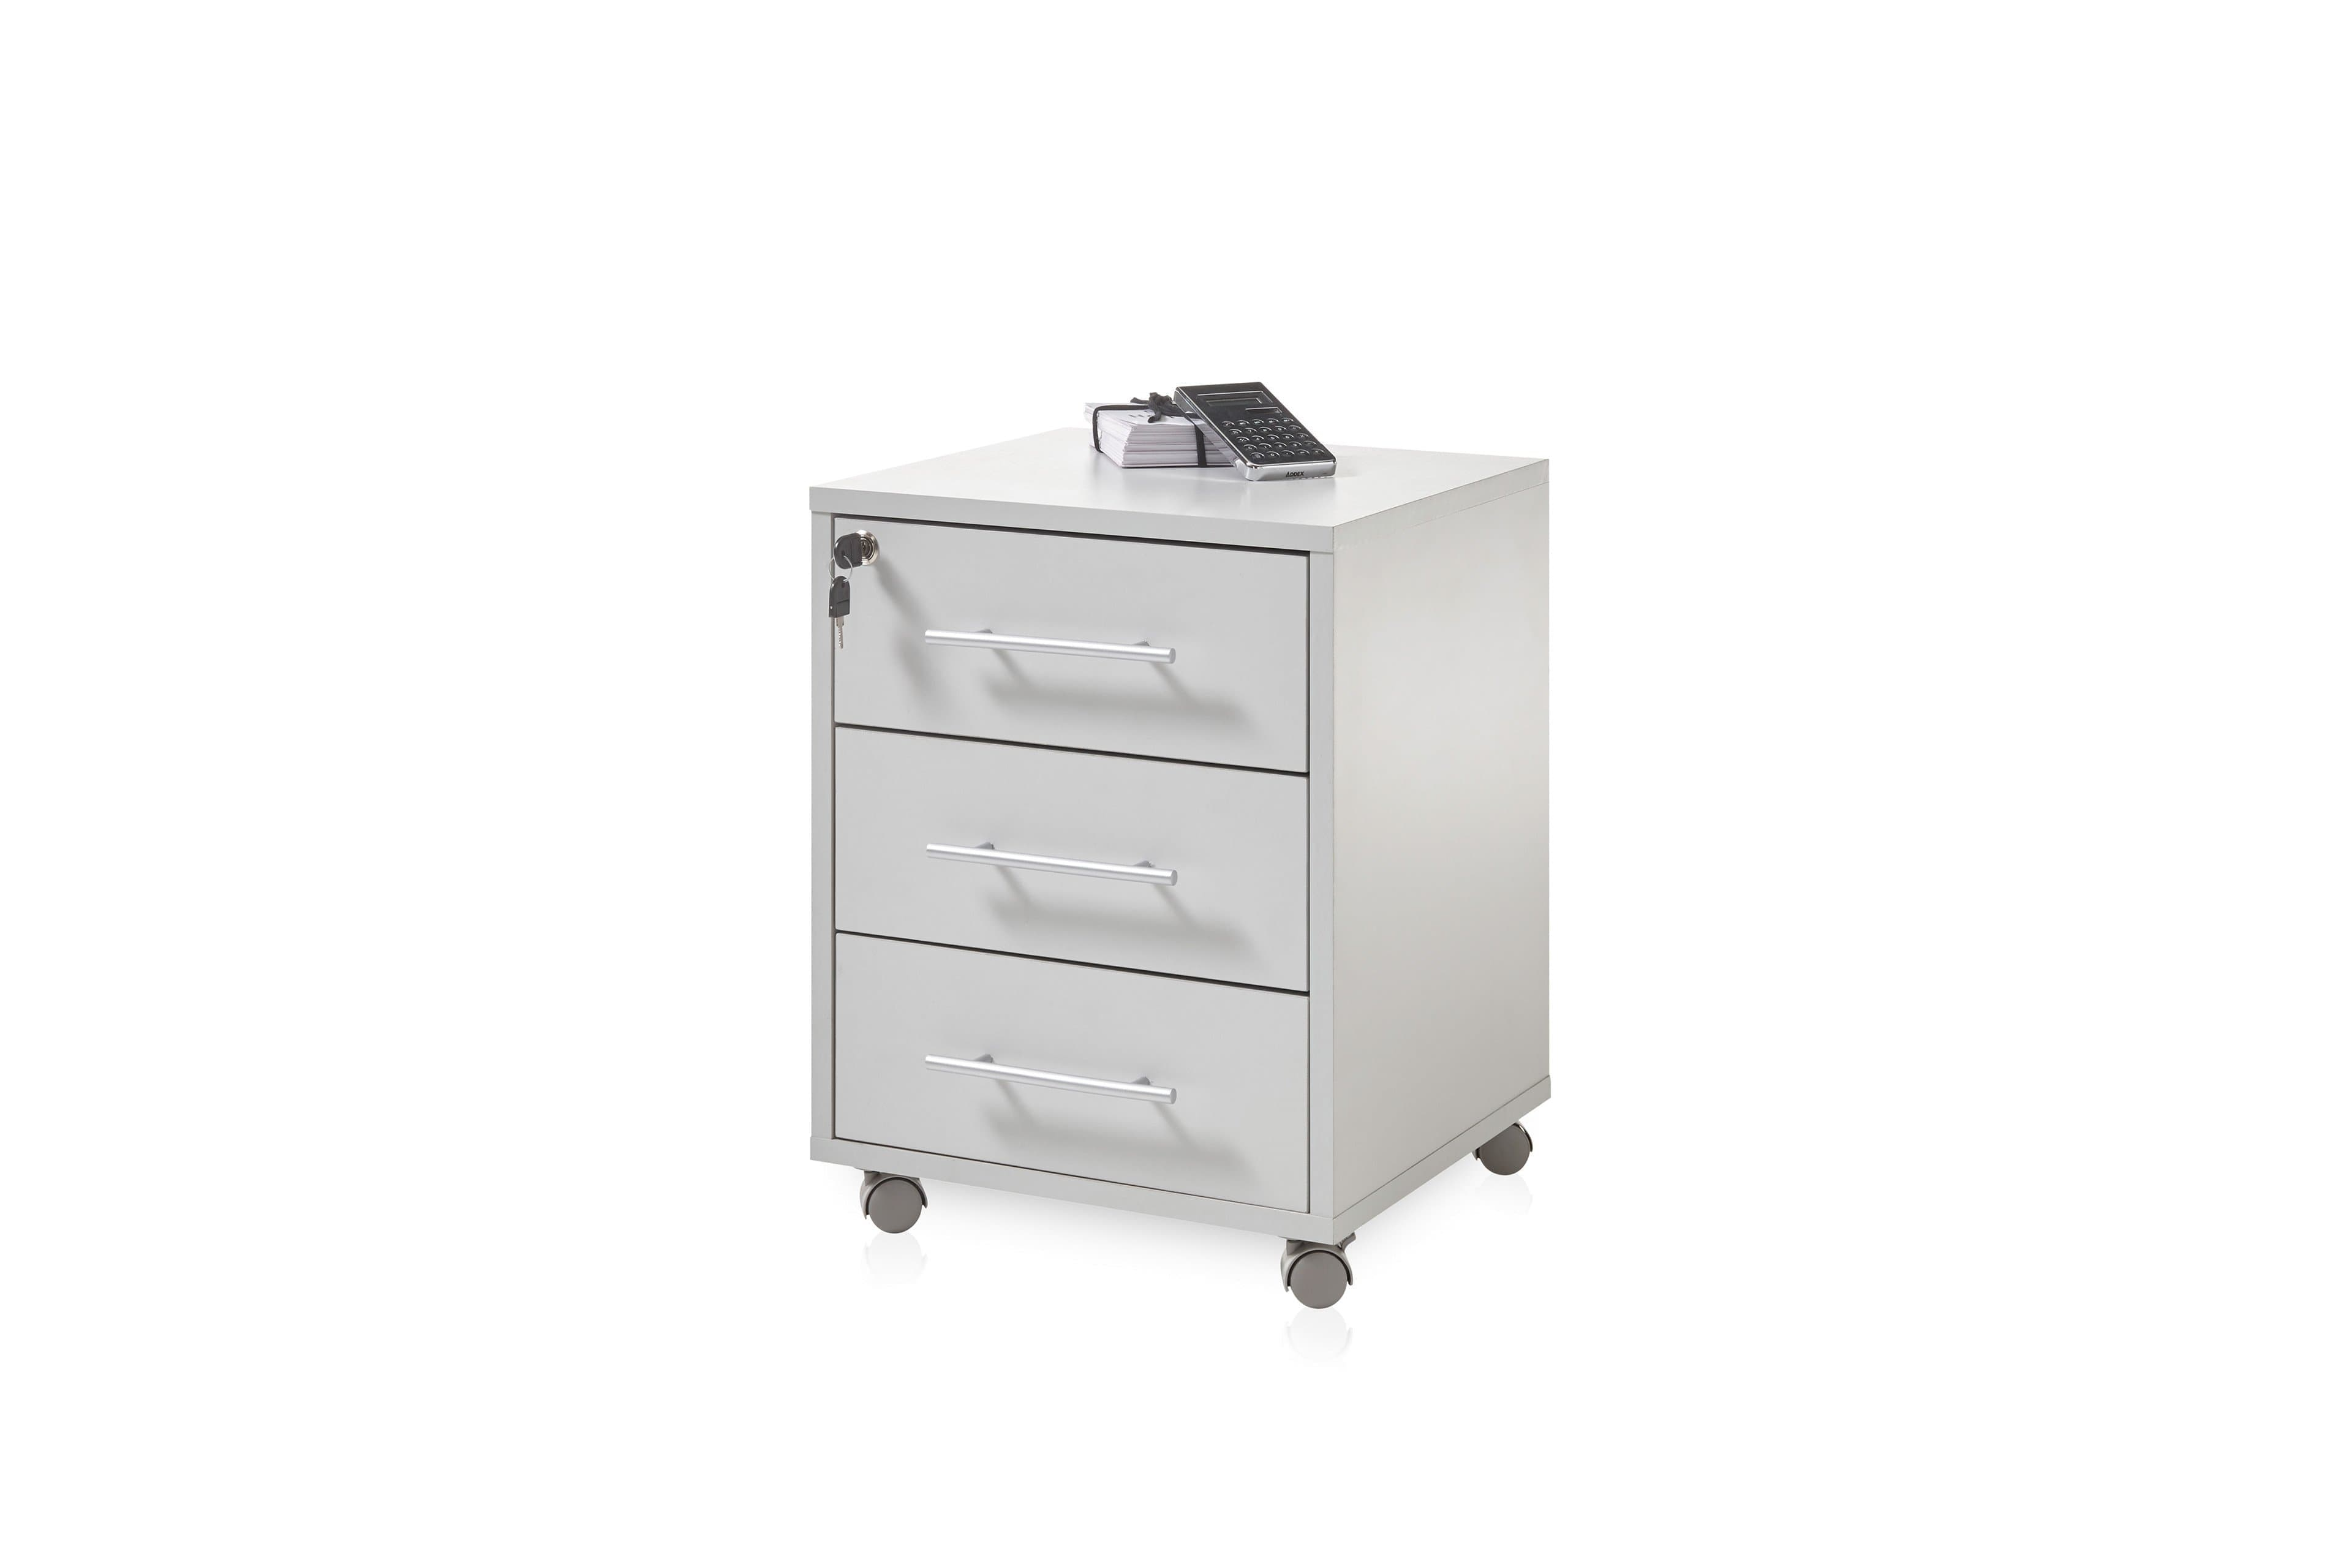 Cabinet din pal pe rotile, cu 3 sertare Prato Gri deschis, l43xA46xH56 cm somproduct.ro imagine 2021